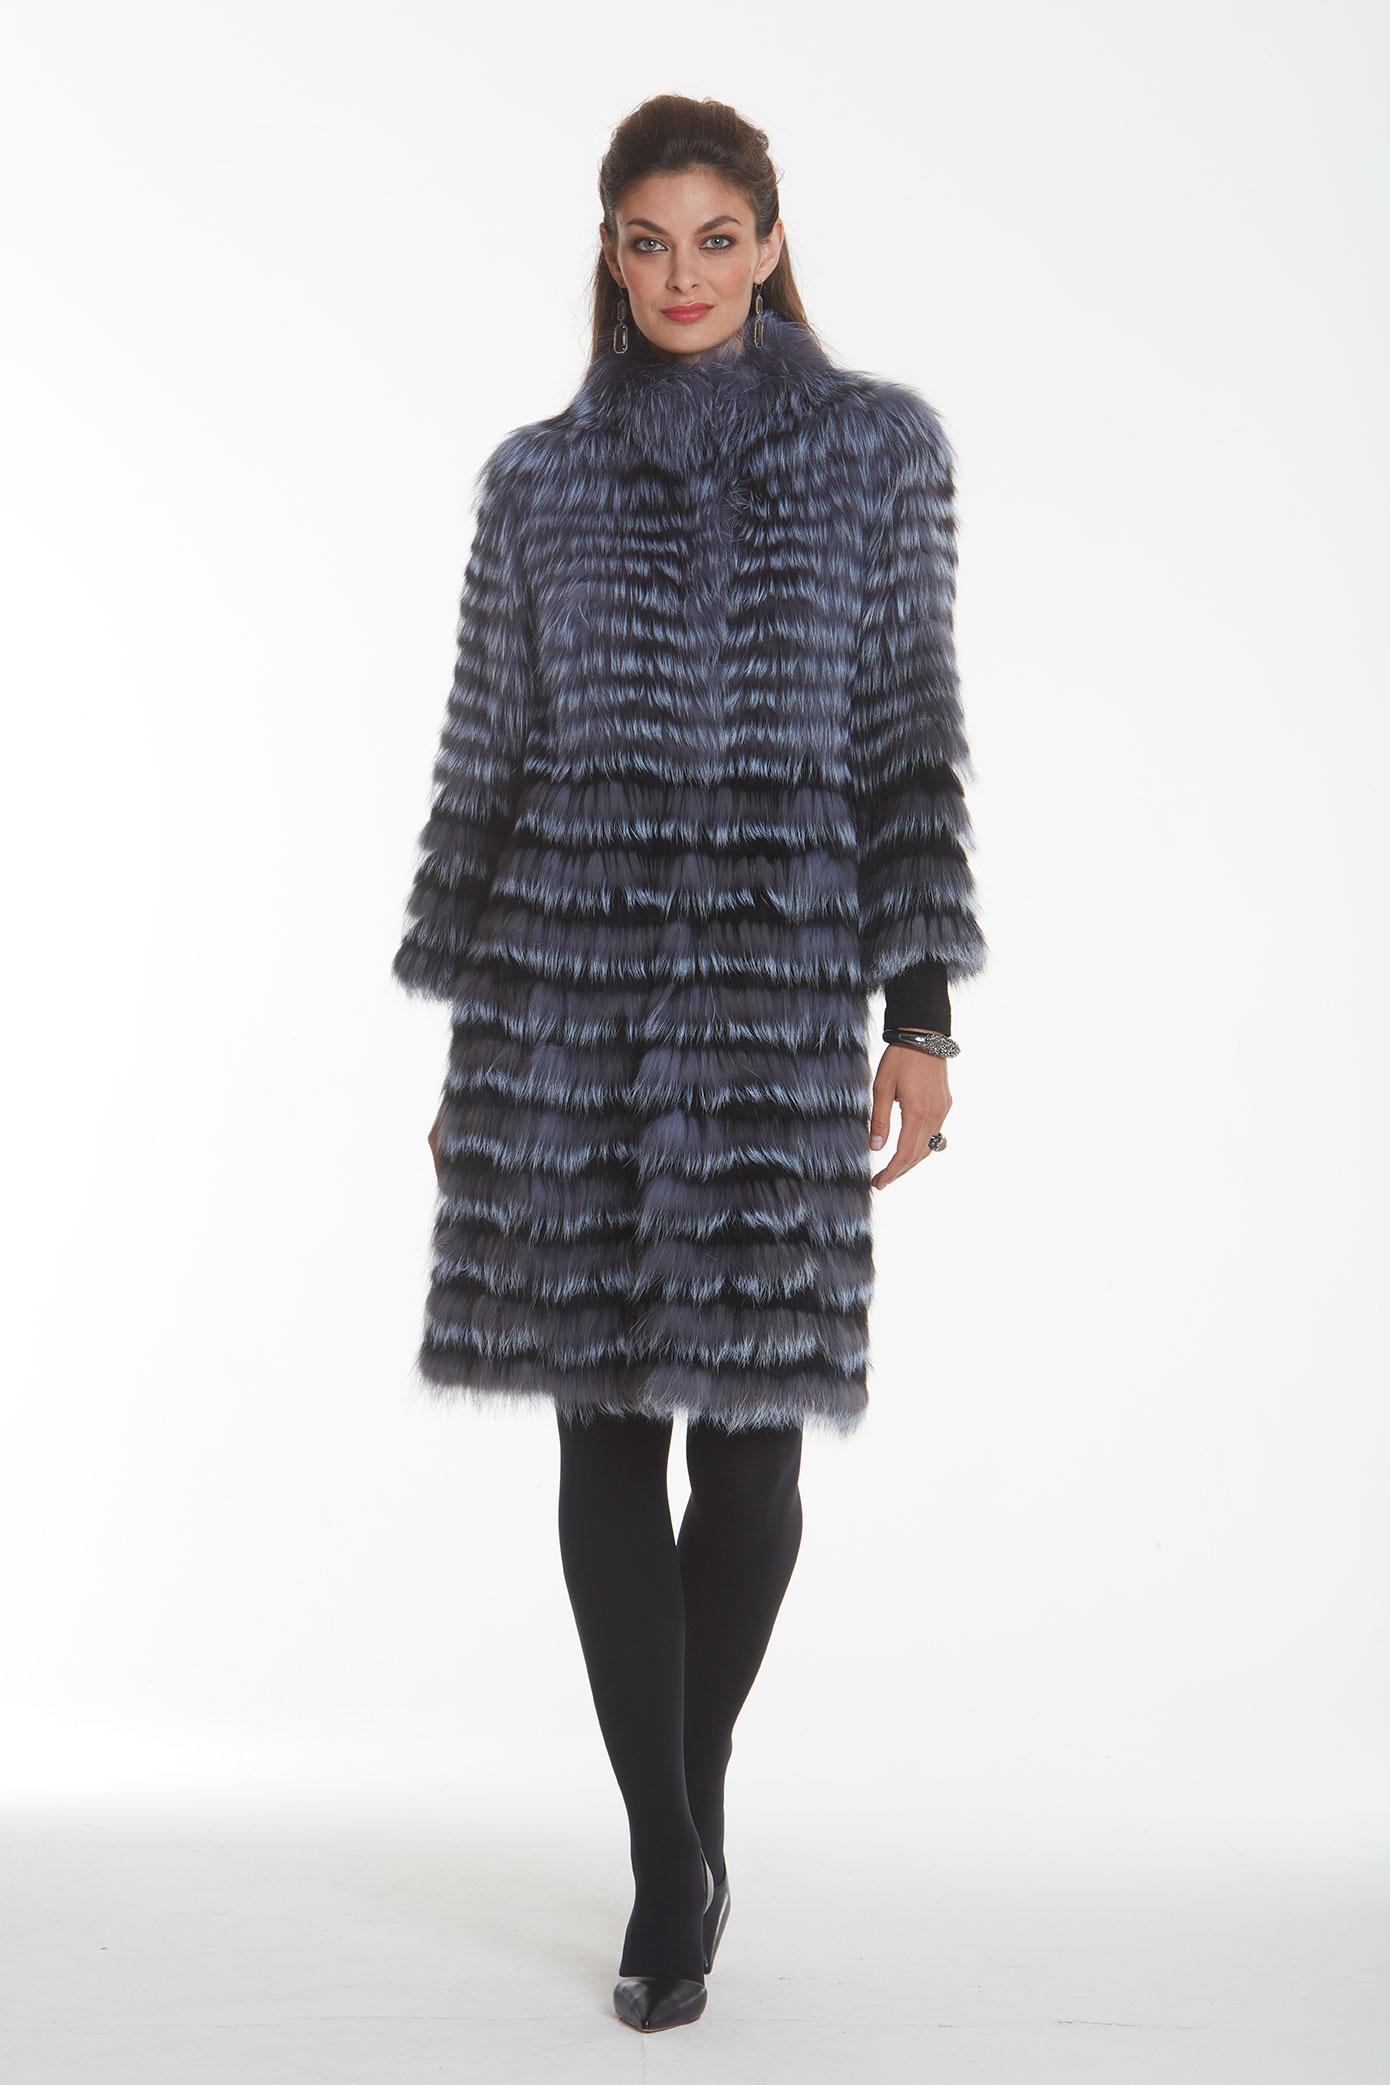 silver fox and black fox fur knee-length coat for ladies